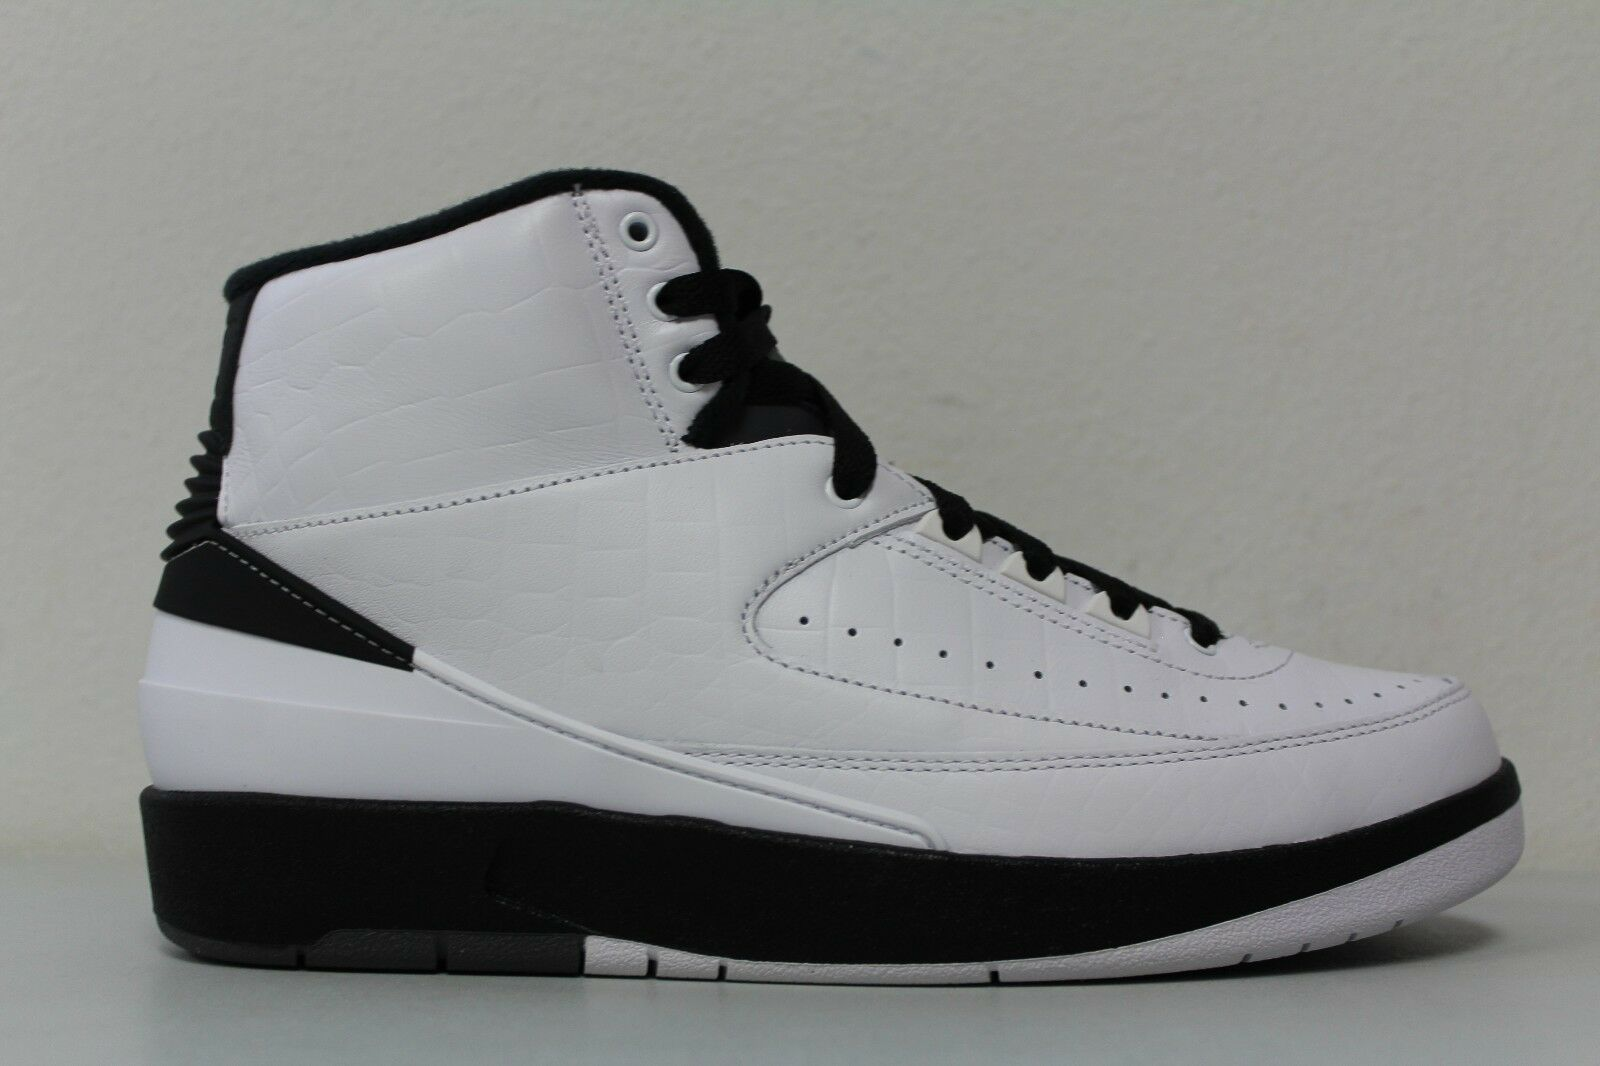 Nike Mens Air Jordan 2 White II Retro Wing It White 2 Black 834272-103 Size 8 351375